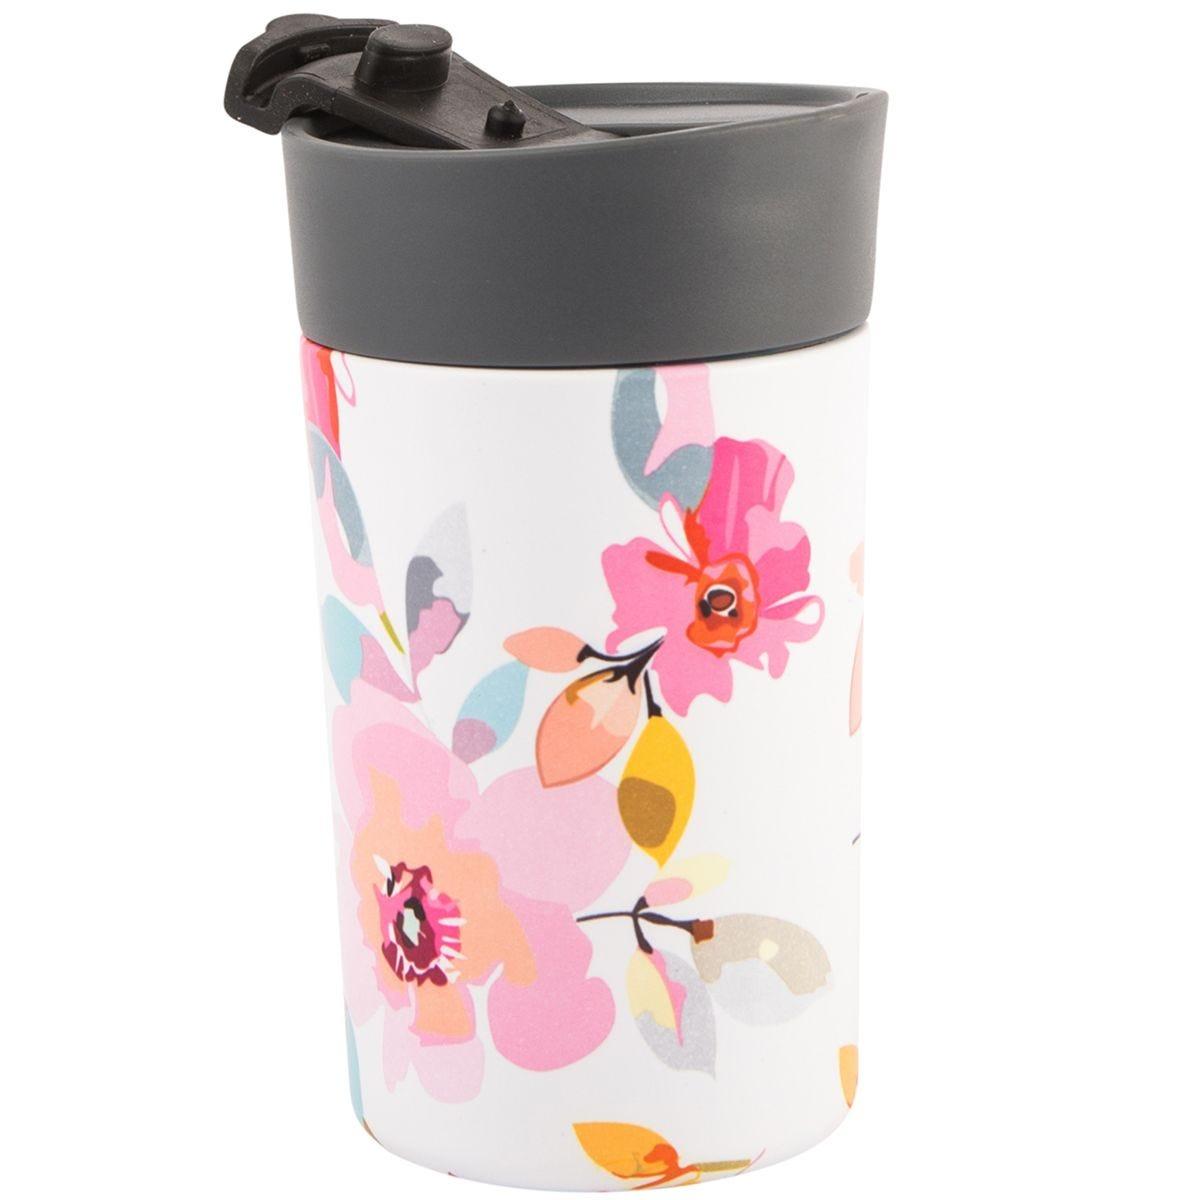 Beau and Elliot Gardenia White Floral Insulated Travel Mug - 300ml